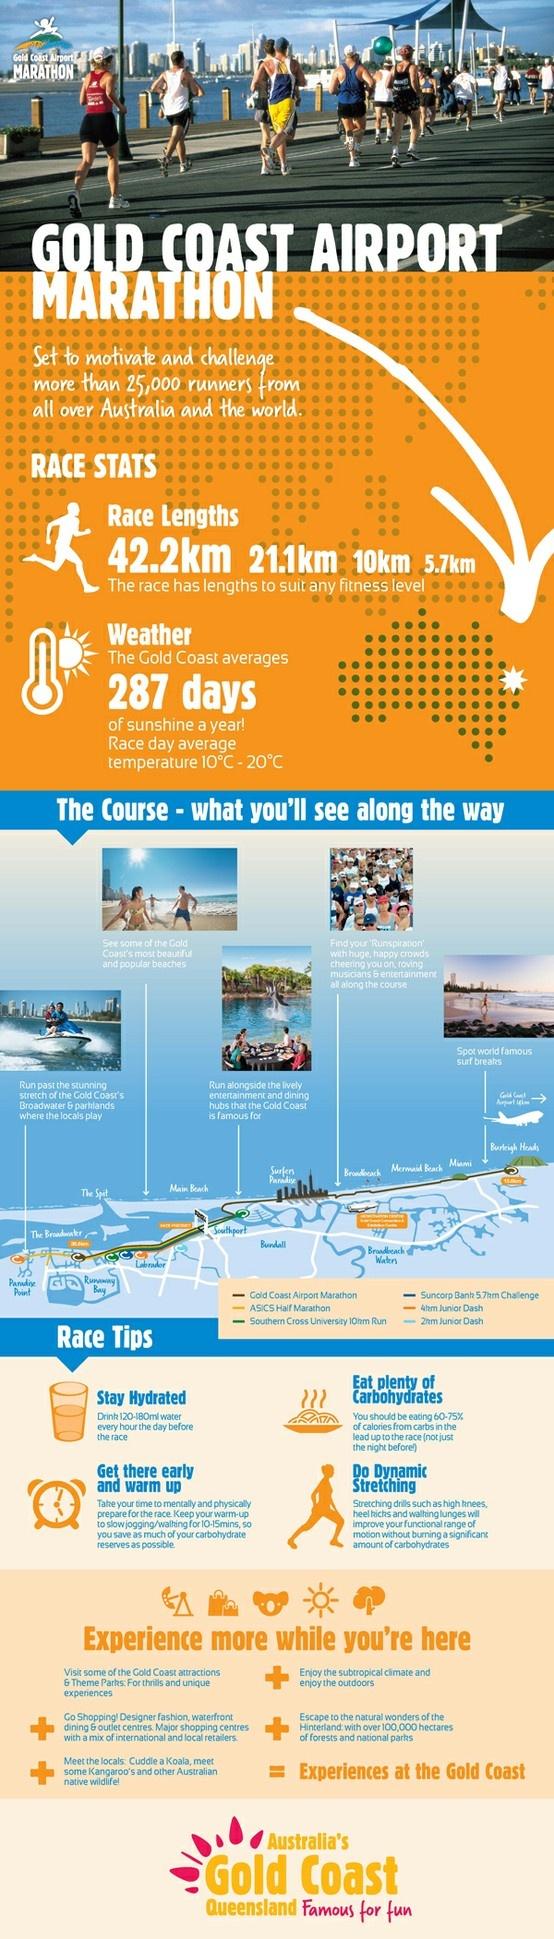 Gold Coast Airport Marathon Fast Facts #infographic #event #goldcoast